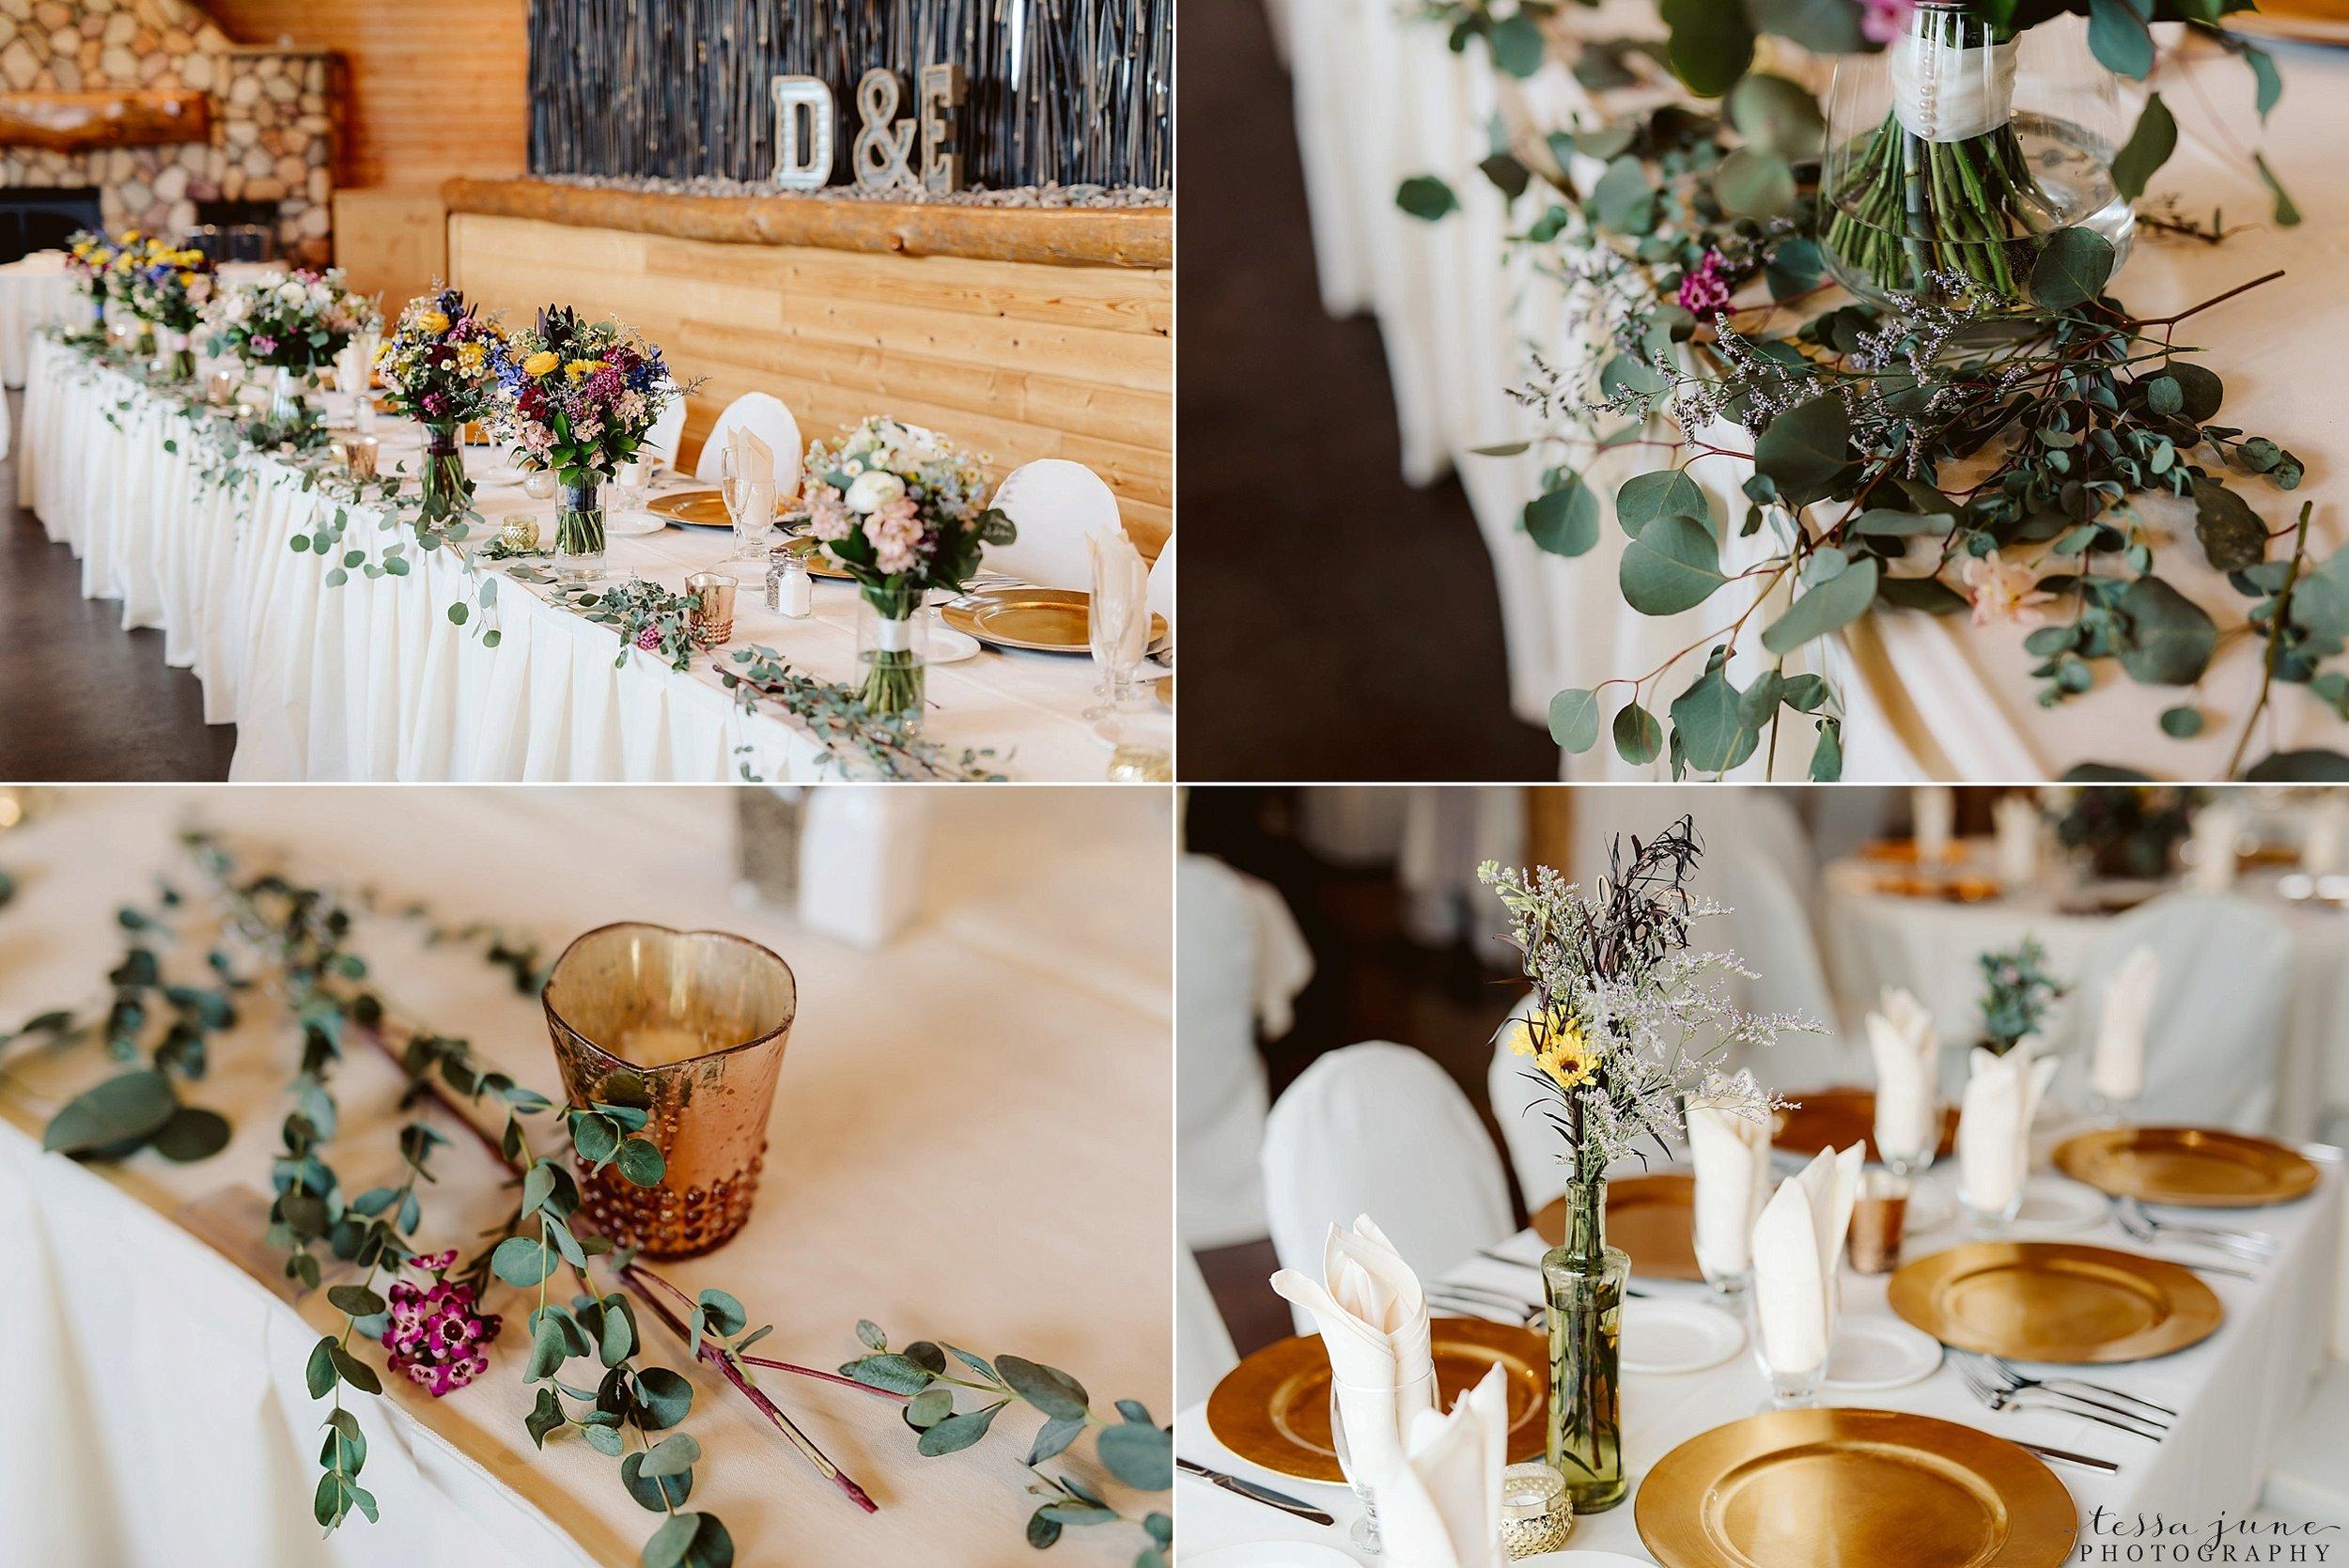 The-grands-at-mulligans-wedding-sartell-minnesota-spring-floral-spring-garden-wedding-13.jpg